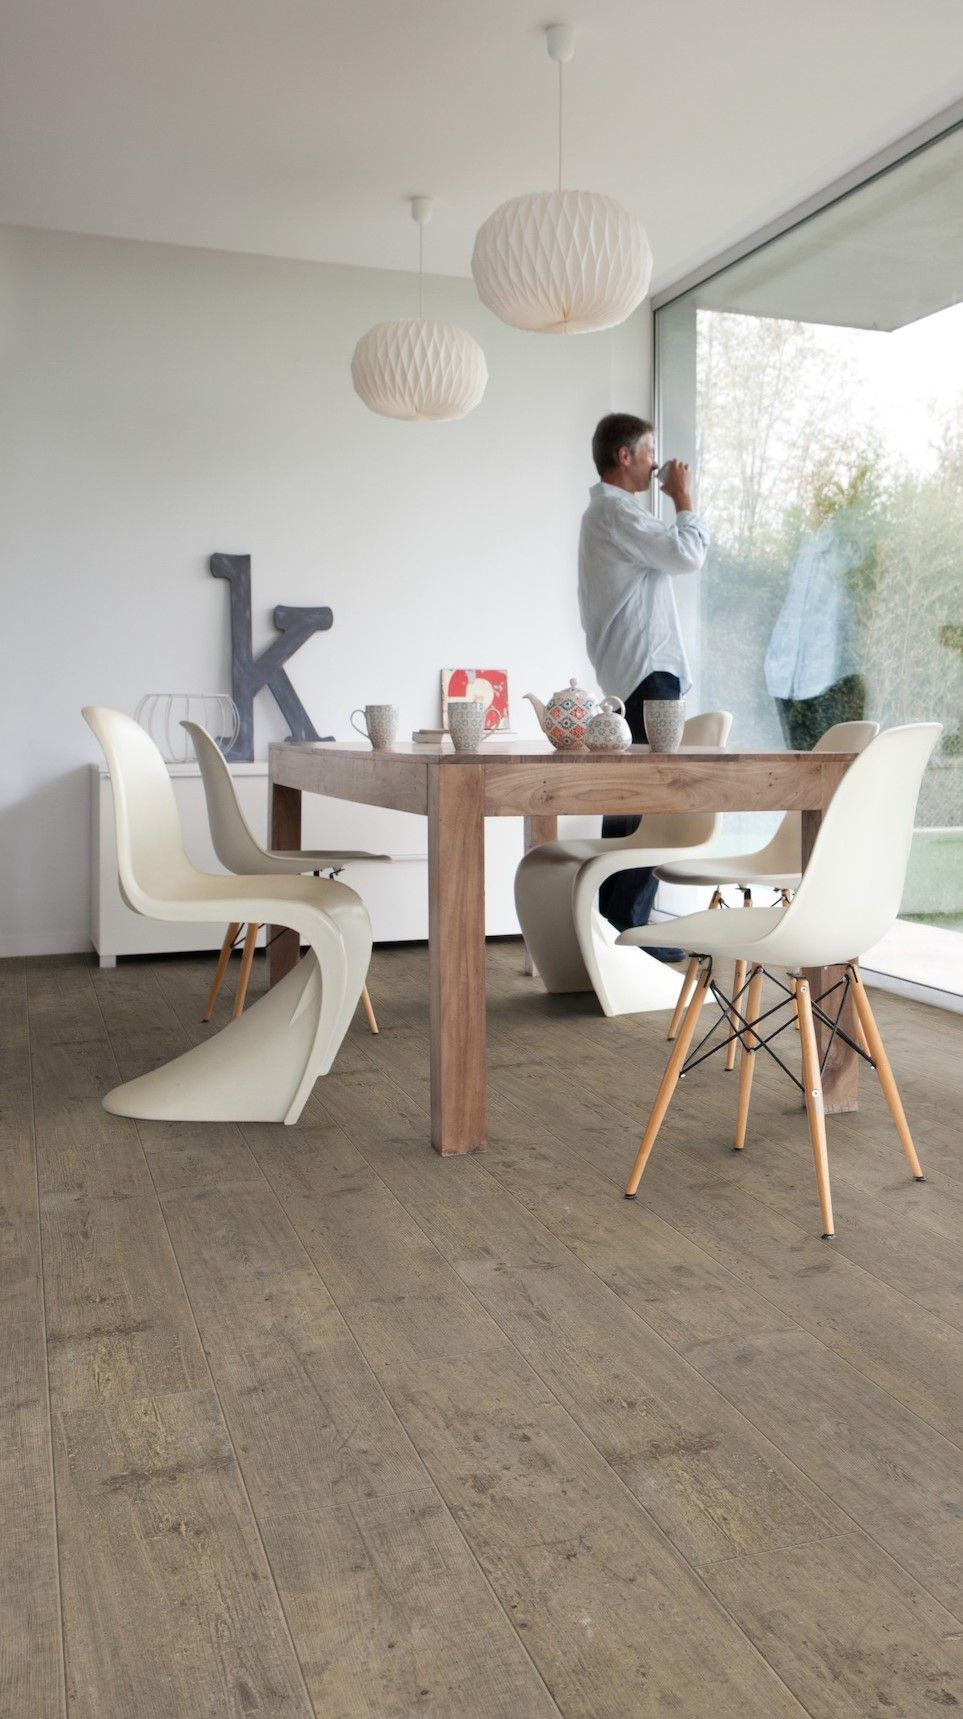 Pvc vloer Home Stick - Lugano screed XL: Zelfklevende pvc vloer ...